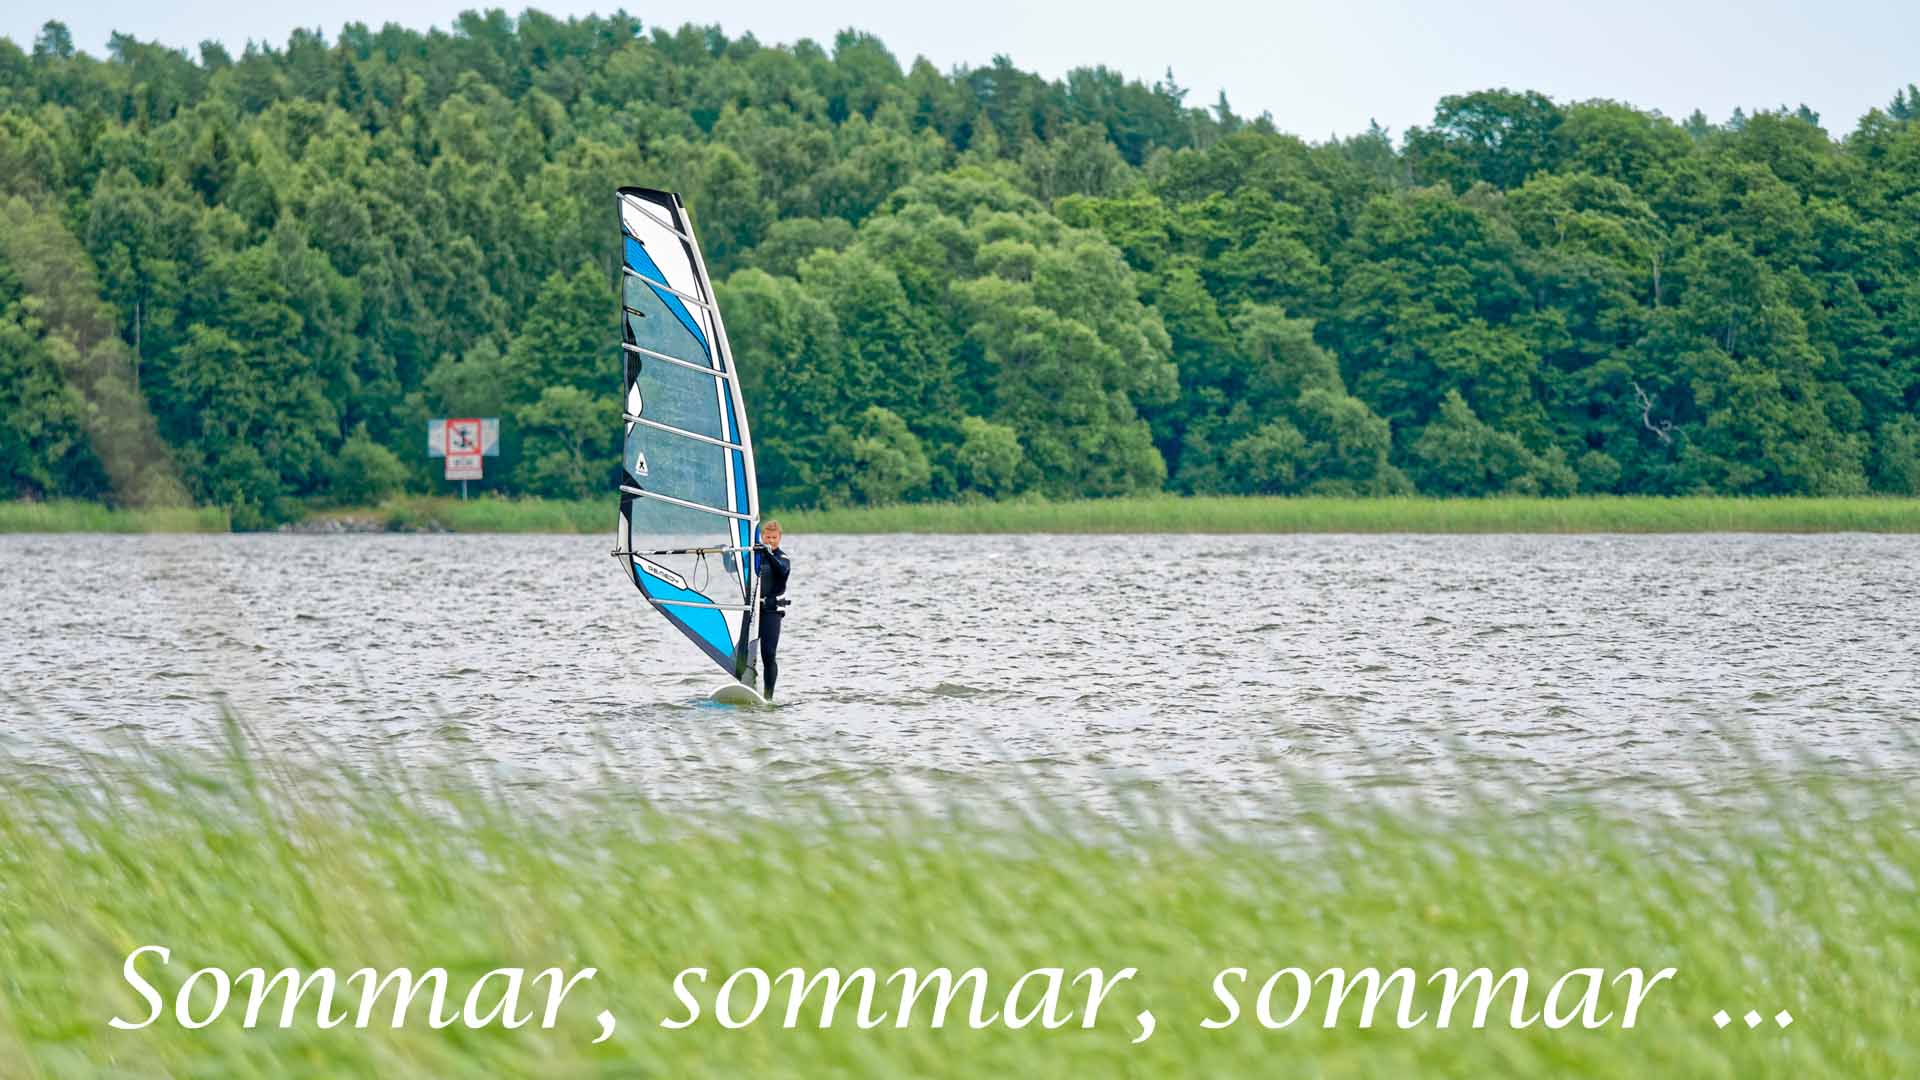 Sommar sommar sommar kopiera